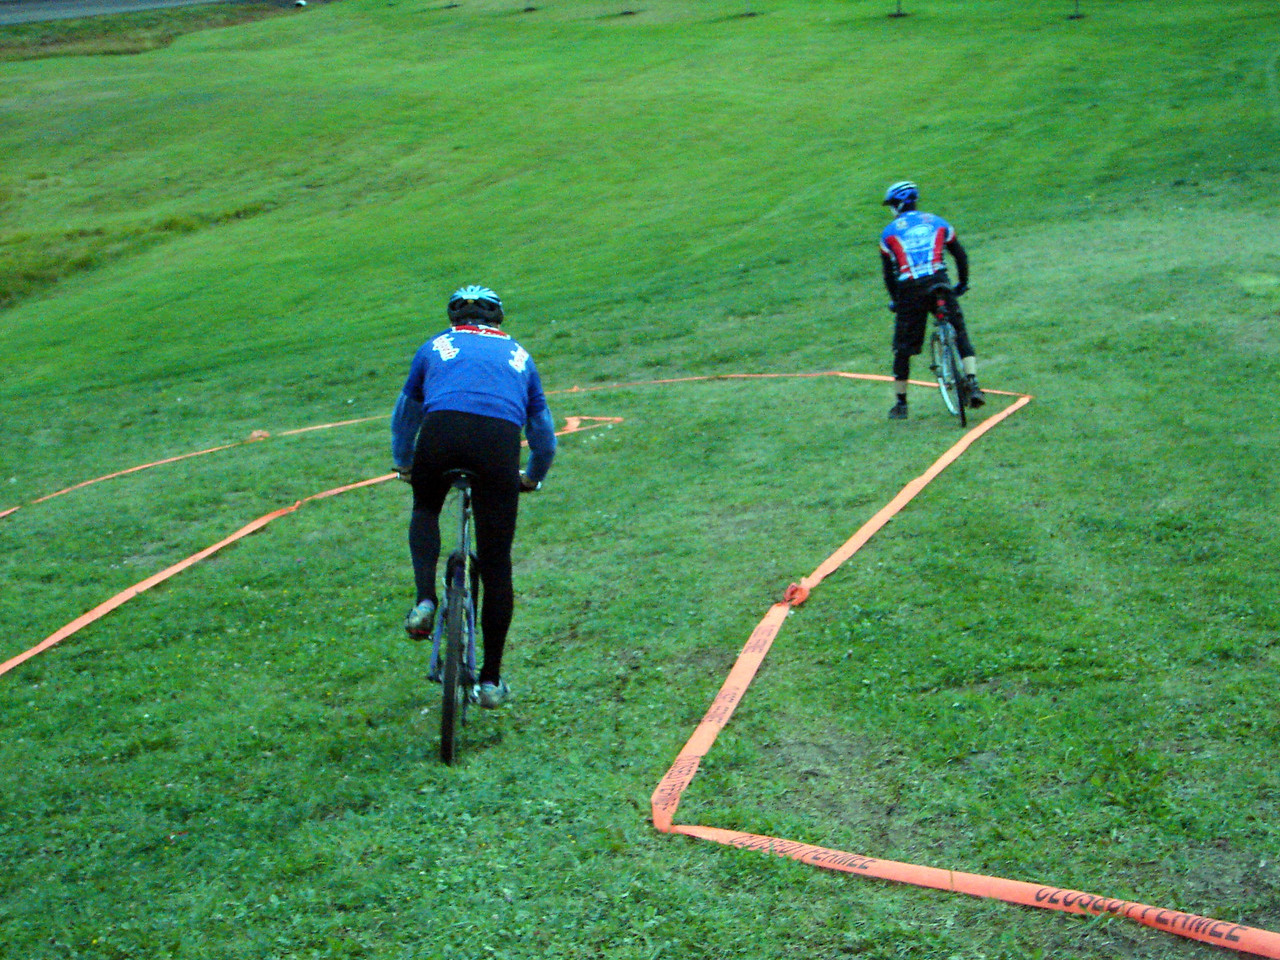 Frank using his downhill skills to blast by Ian.